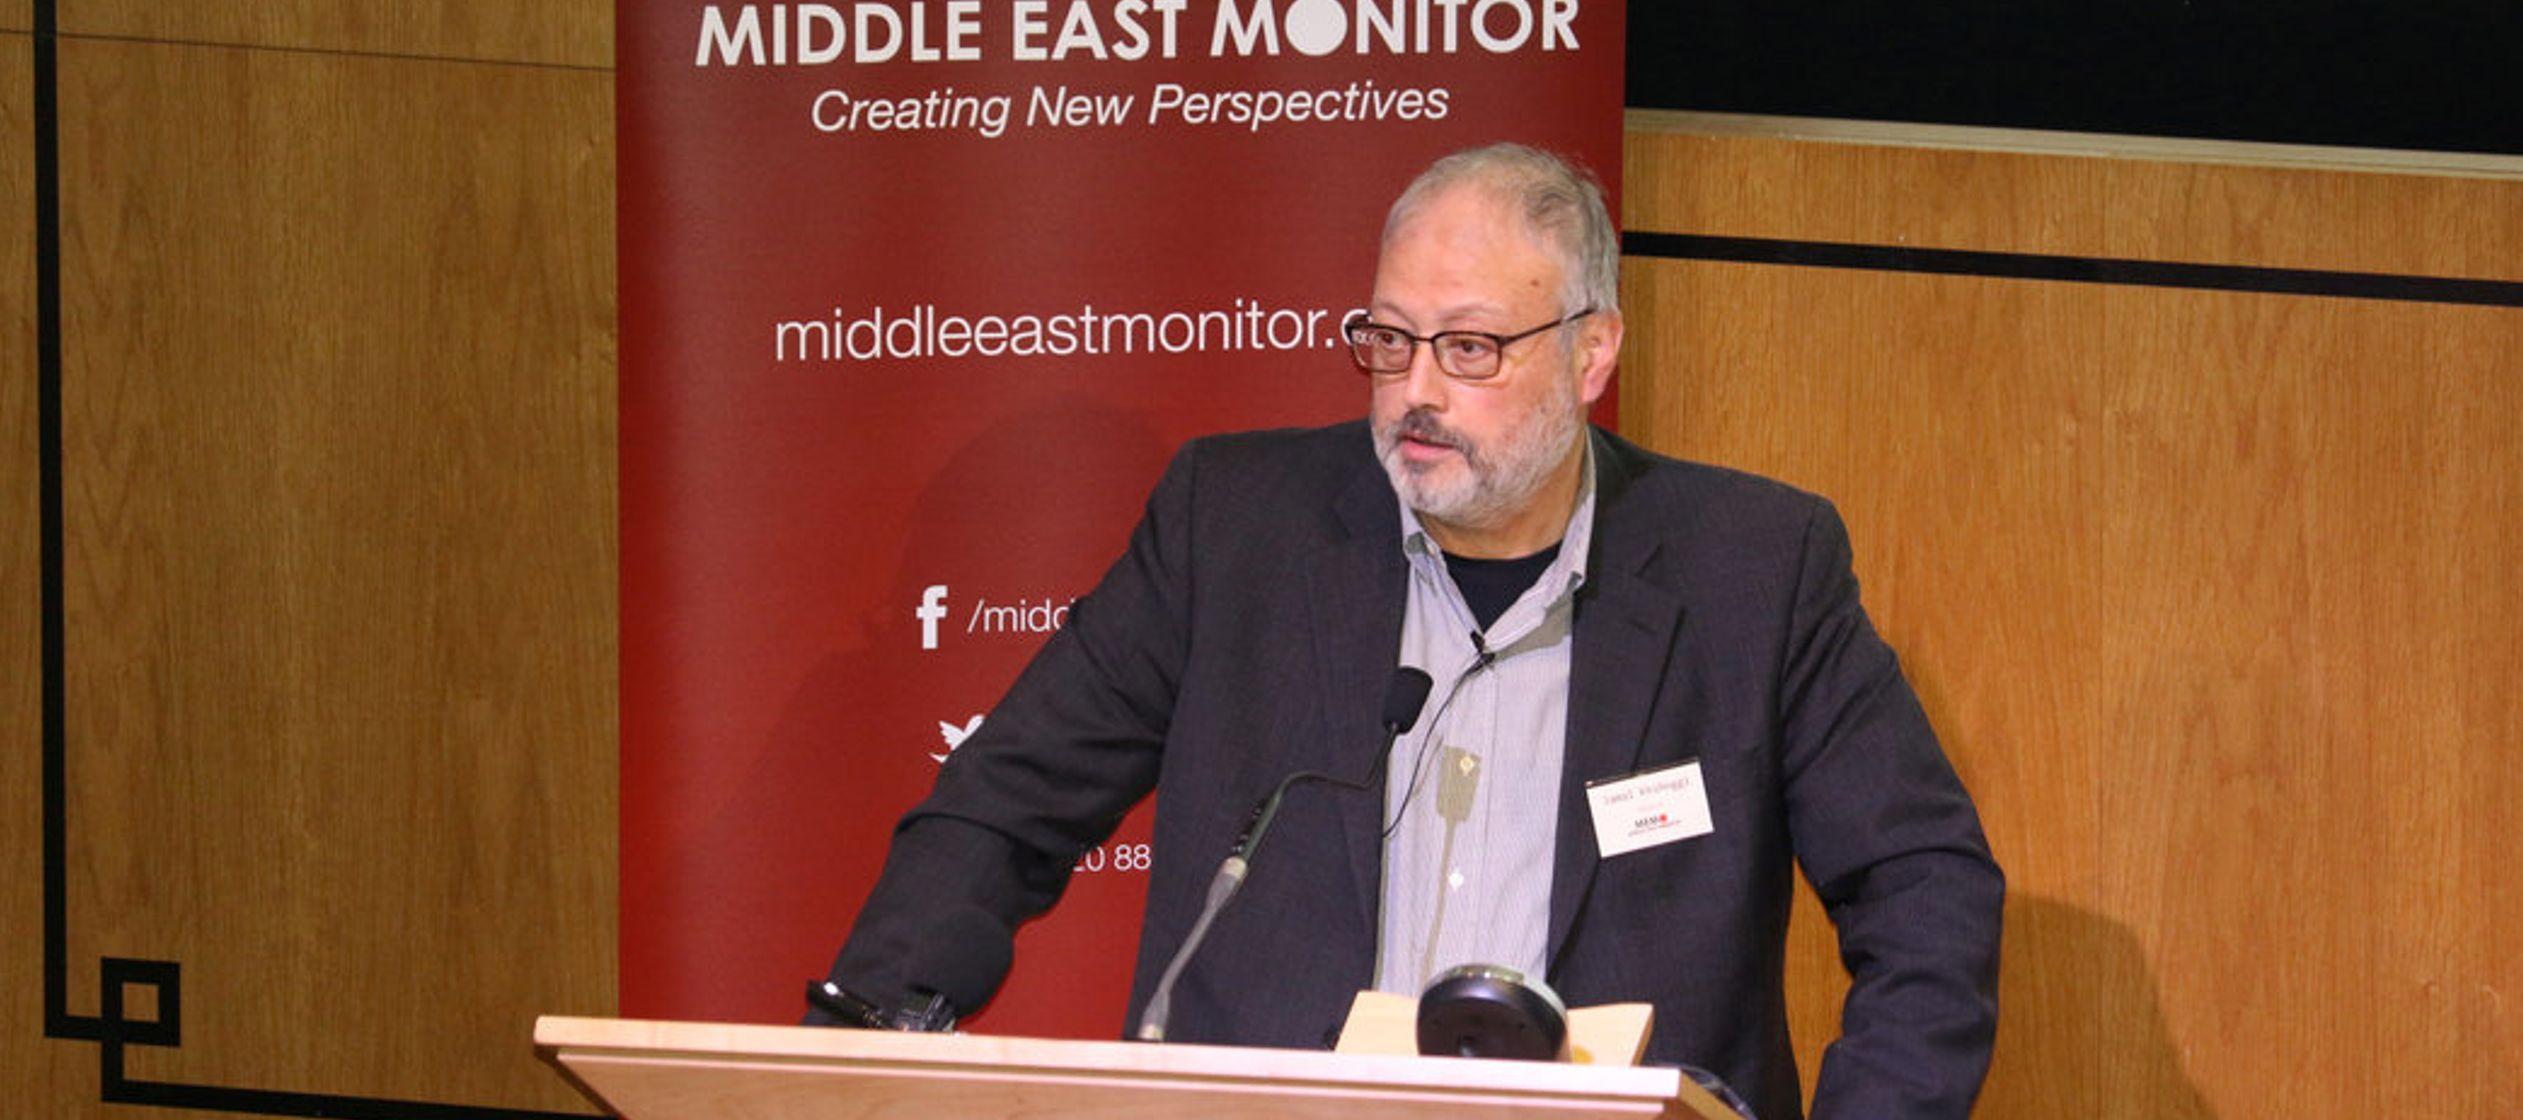 Quién es Jamal Khashoggi, el periodista saudita desaparecido